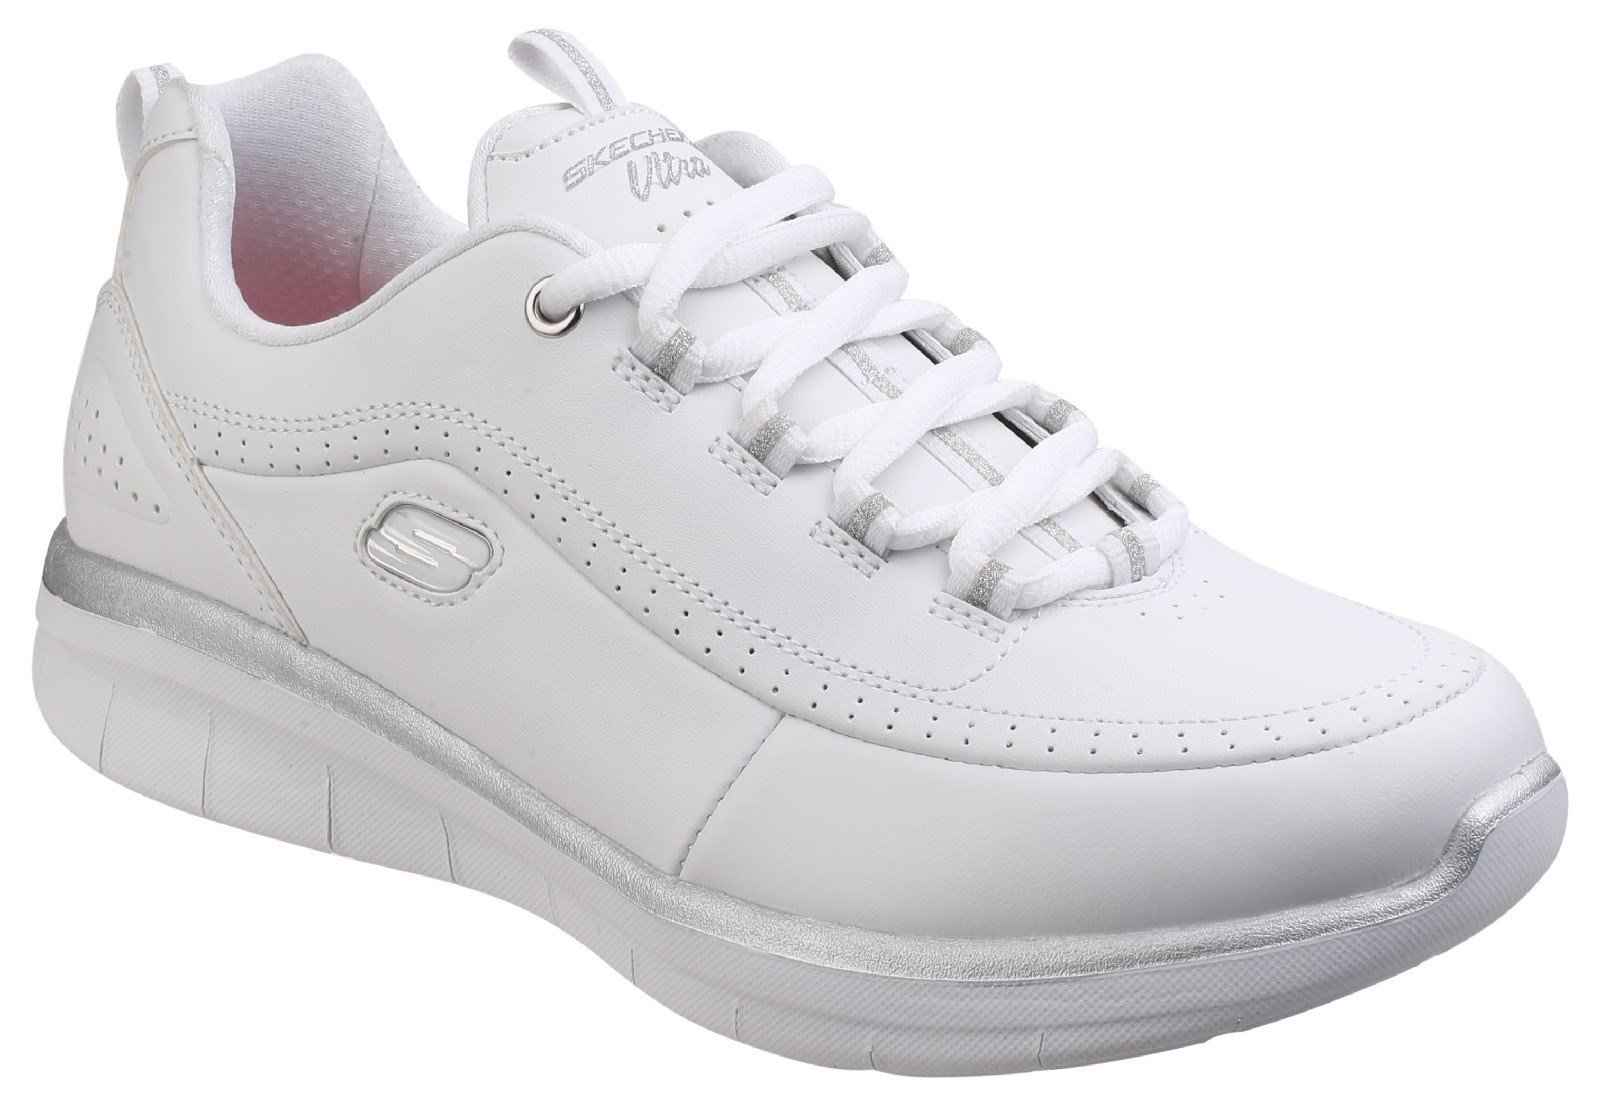 Skechers Women's Synergy 2.0 Sneaker Trainer Multicolor 25827 - White/Silver 5